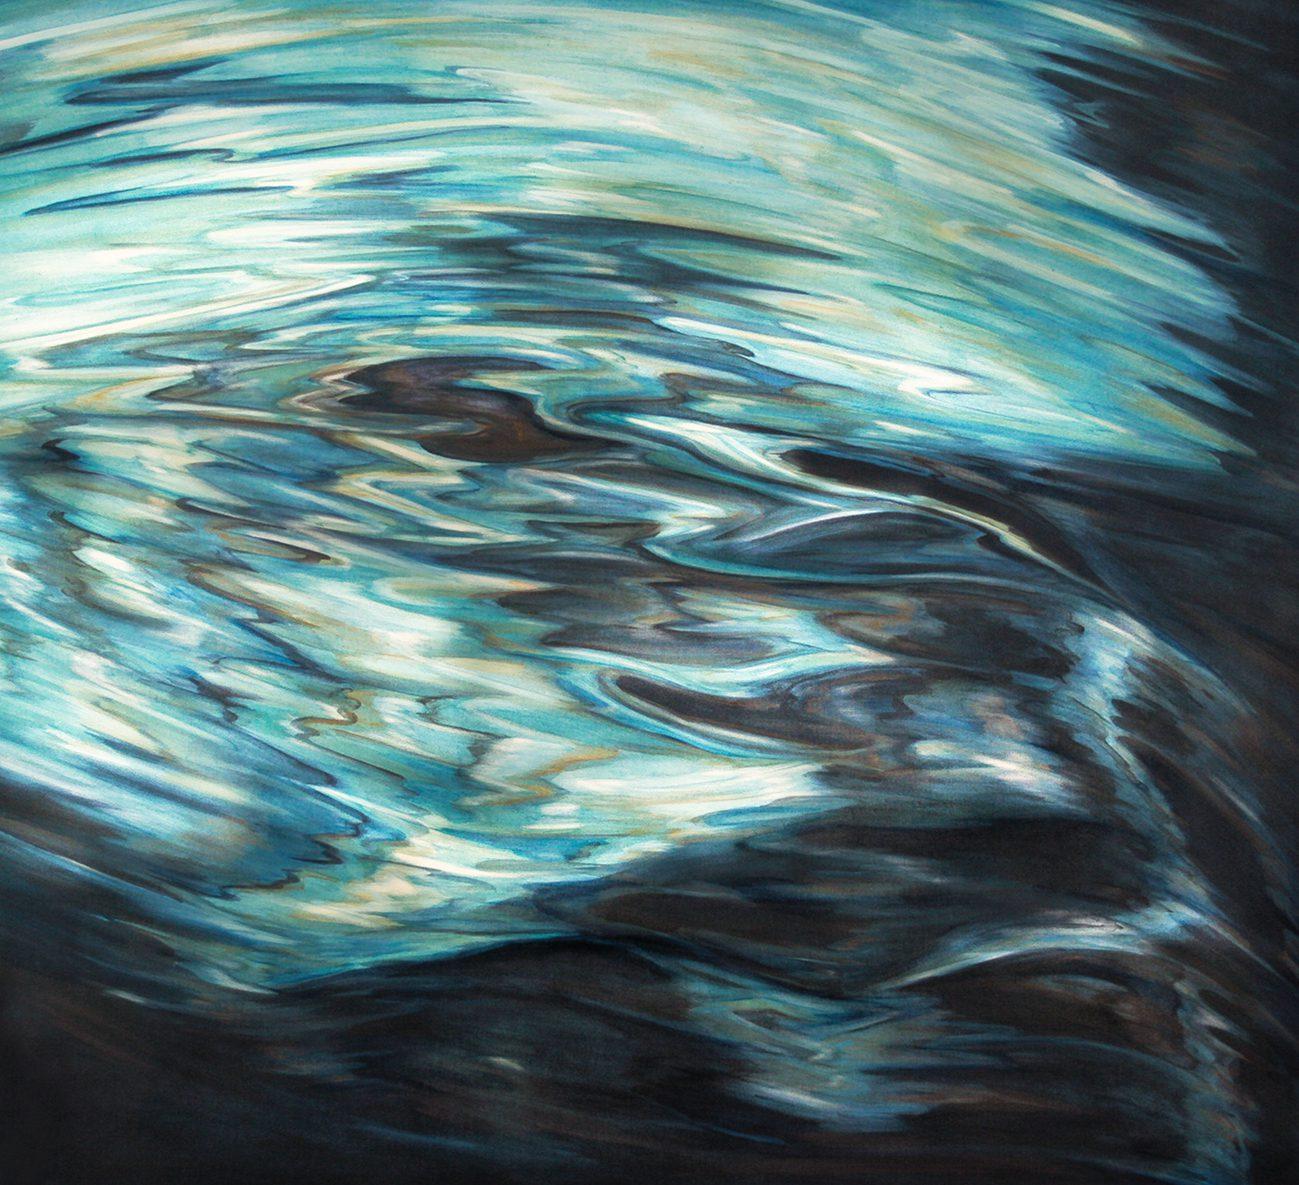 L'Arno 5, 2013. Oil on canvas, 93 x 83 cm